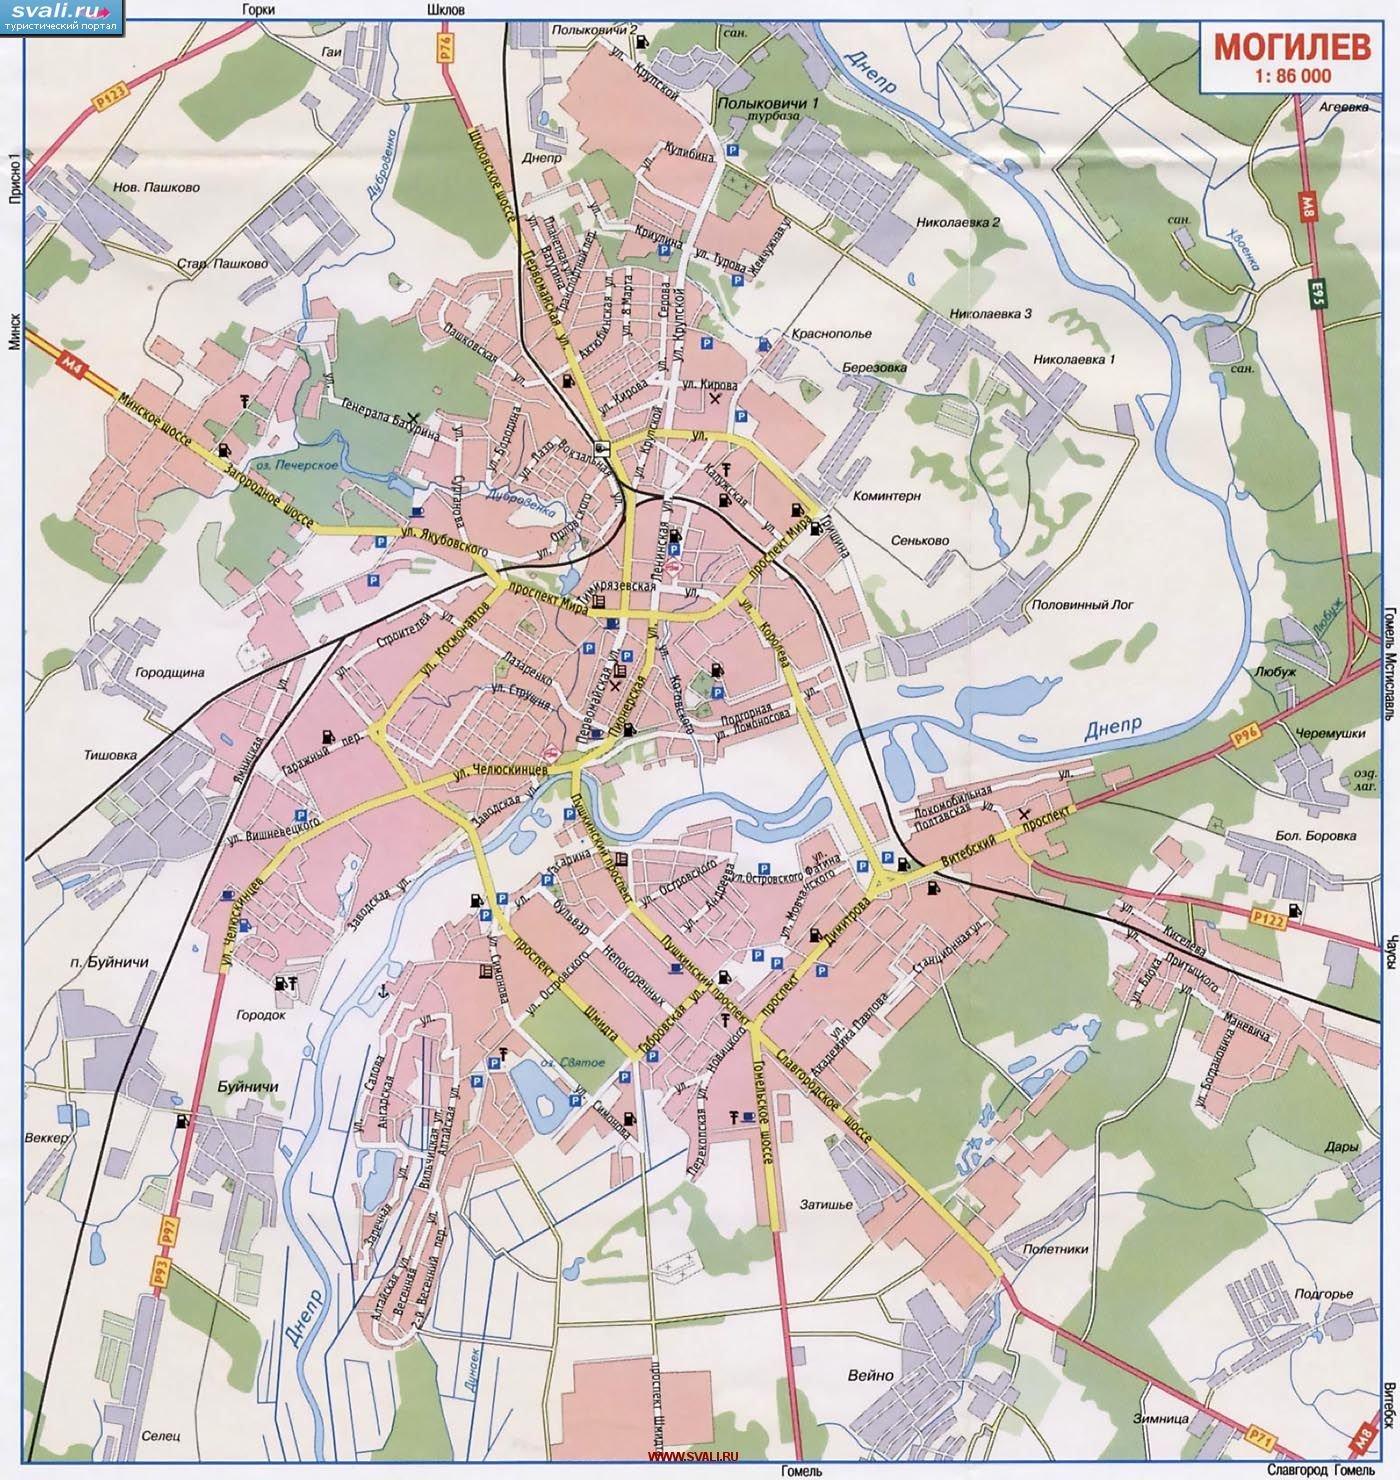 Карты Могилева (Беларусь). Подробная карта Могилева на русском языке ... e4347ad3ae2